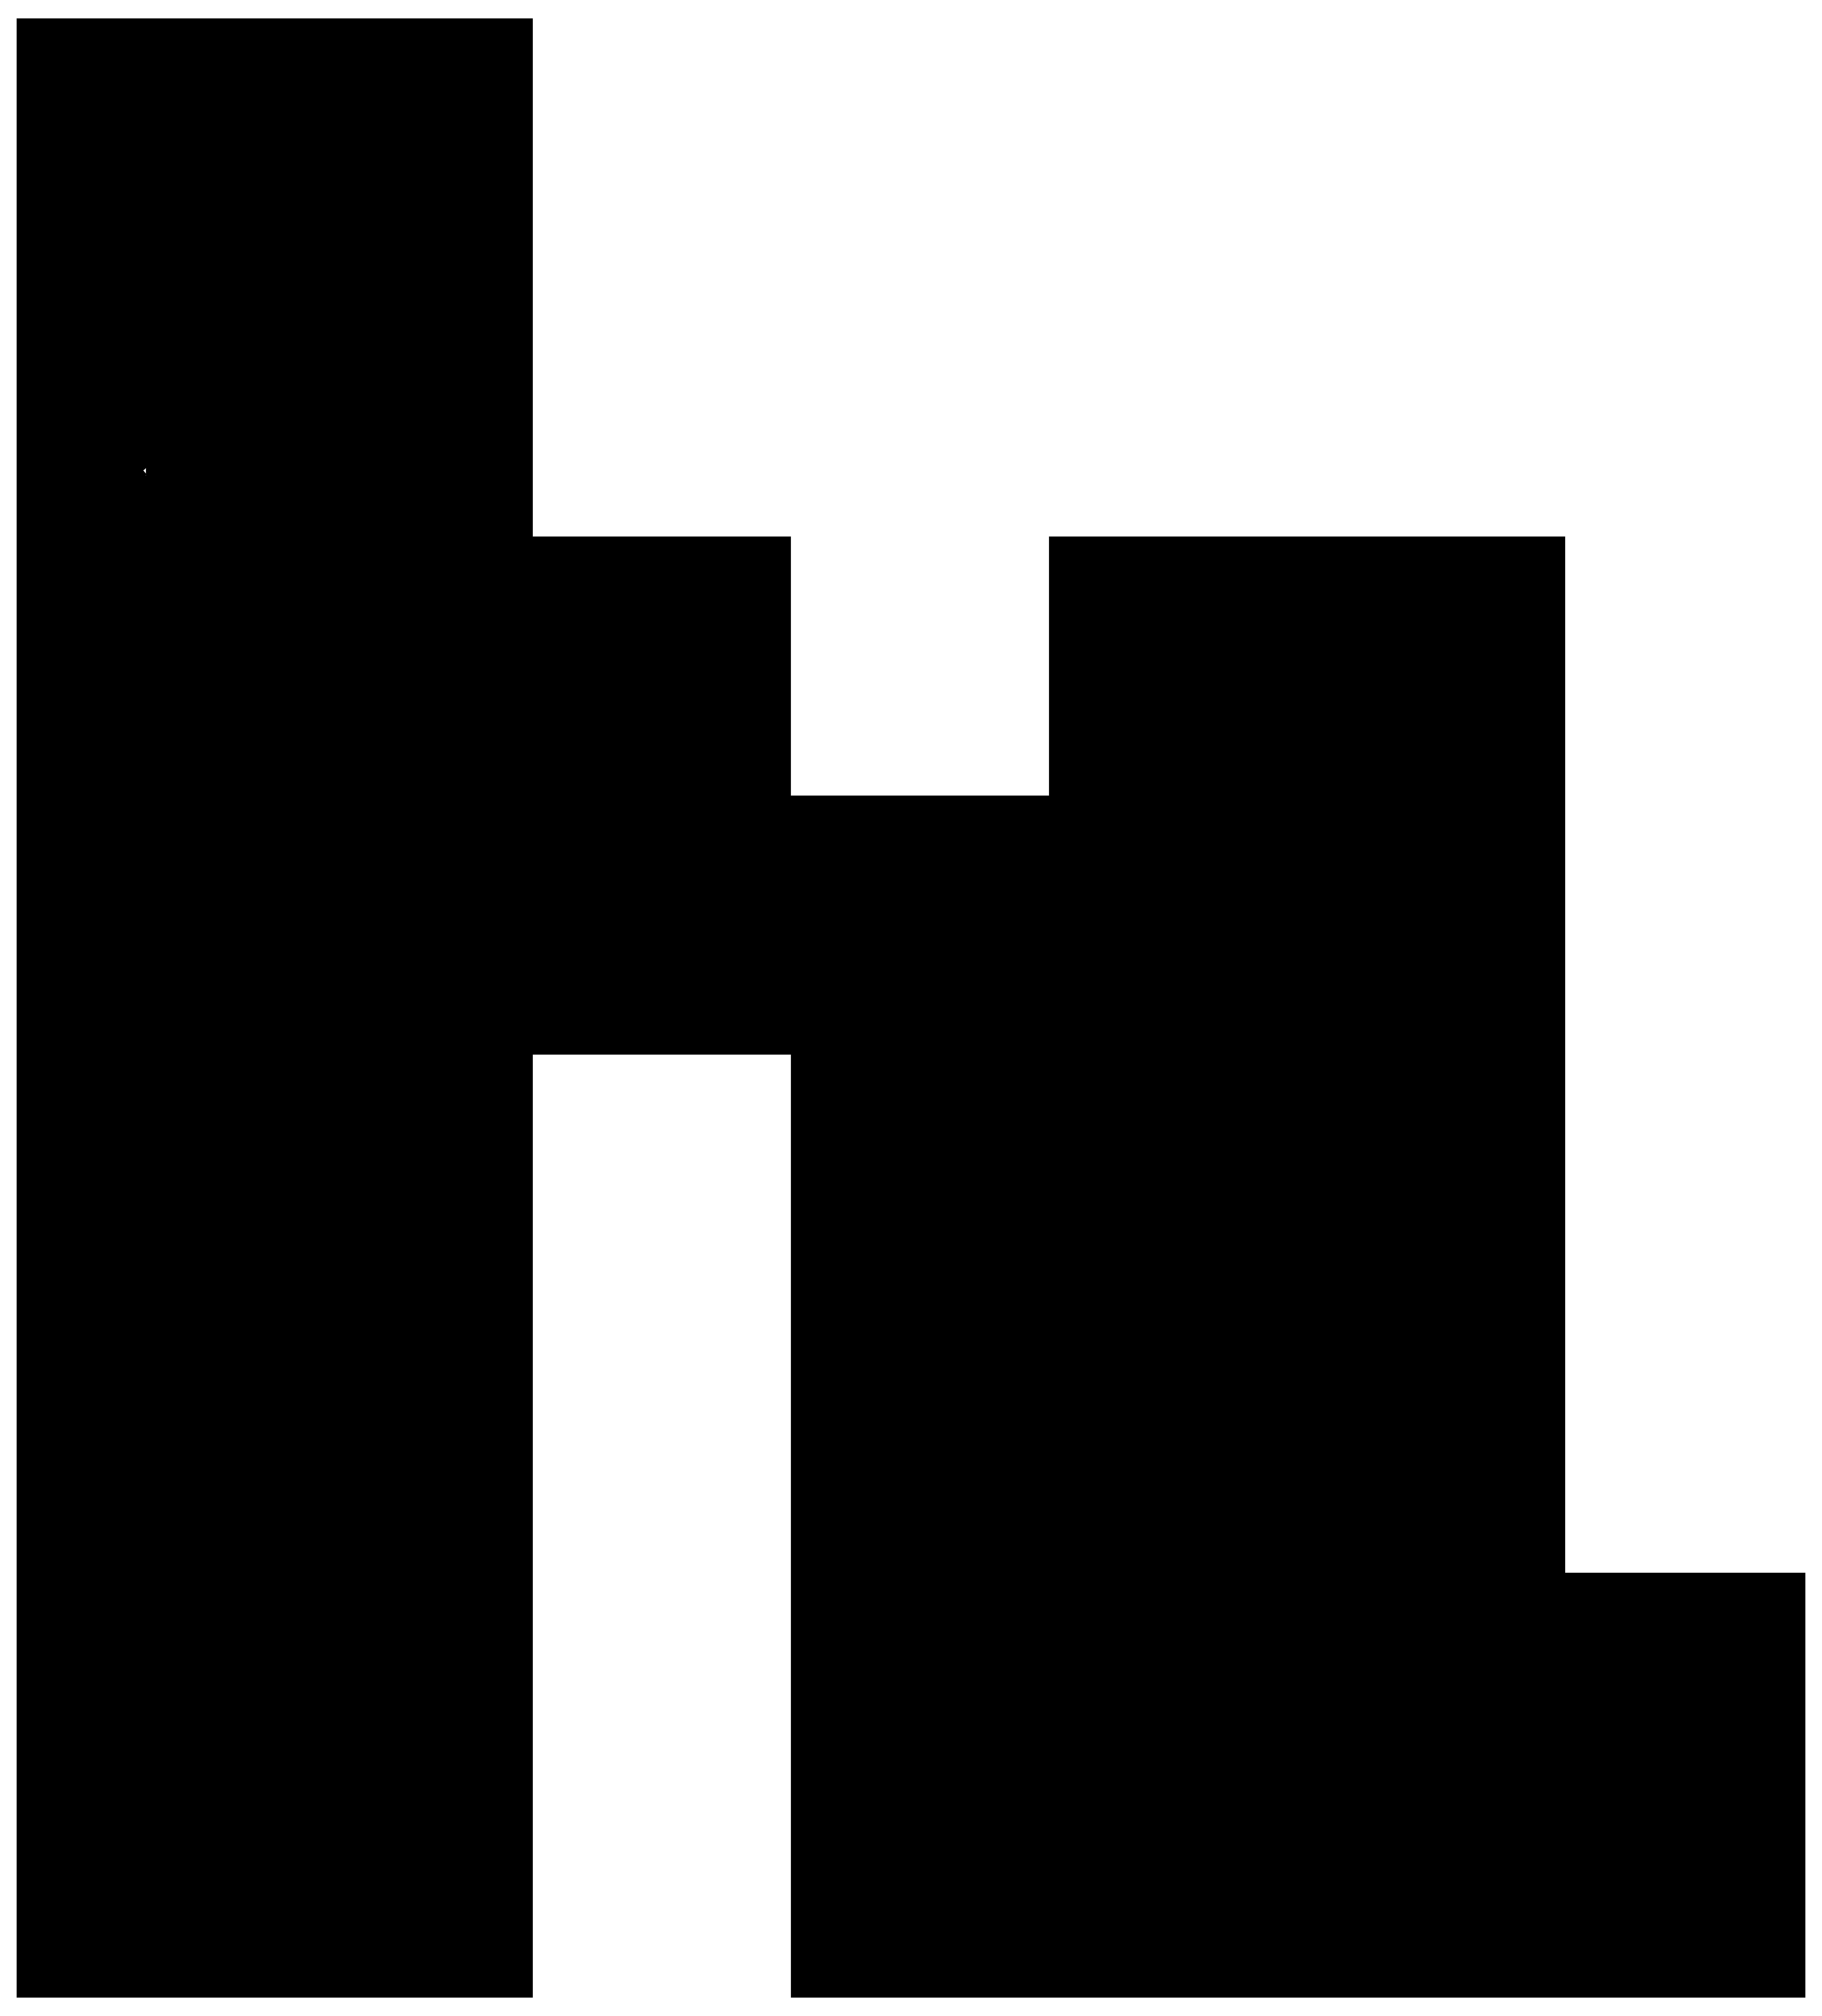 7229x8000 Silhouette Clipart Couple